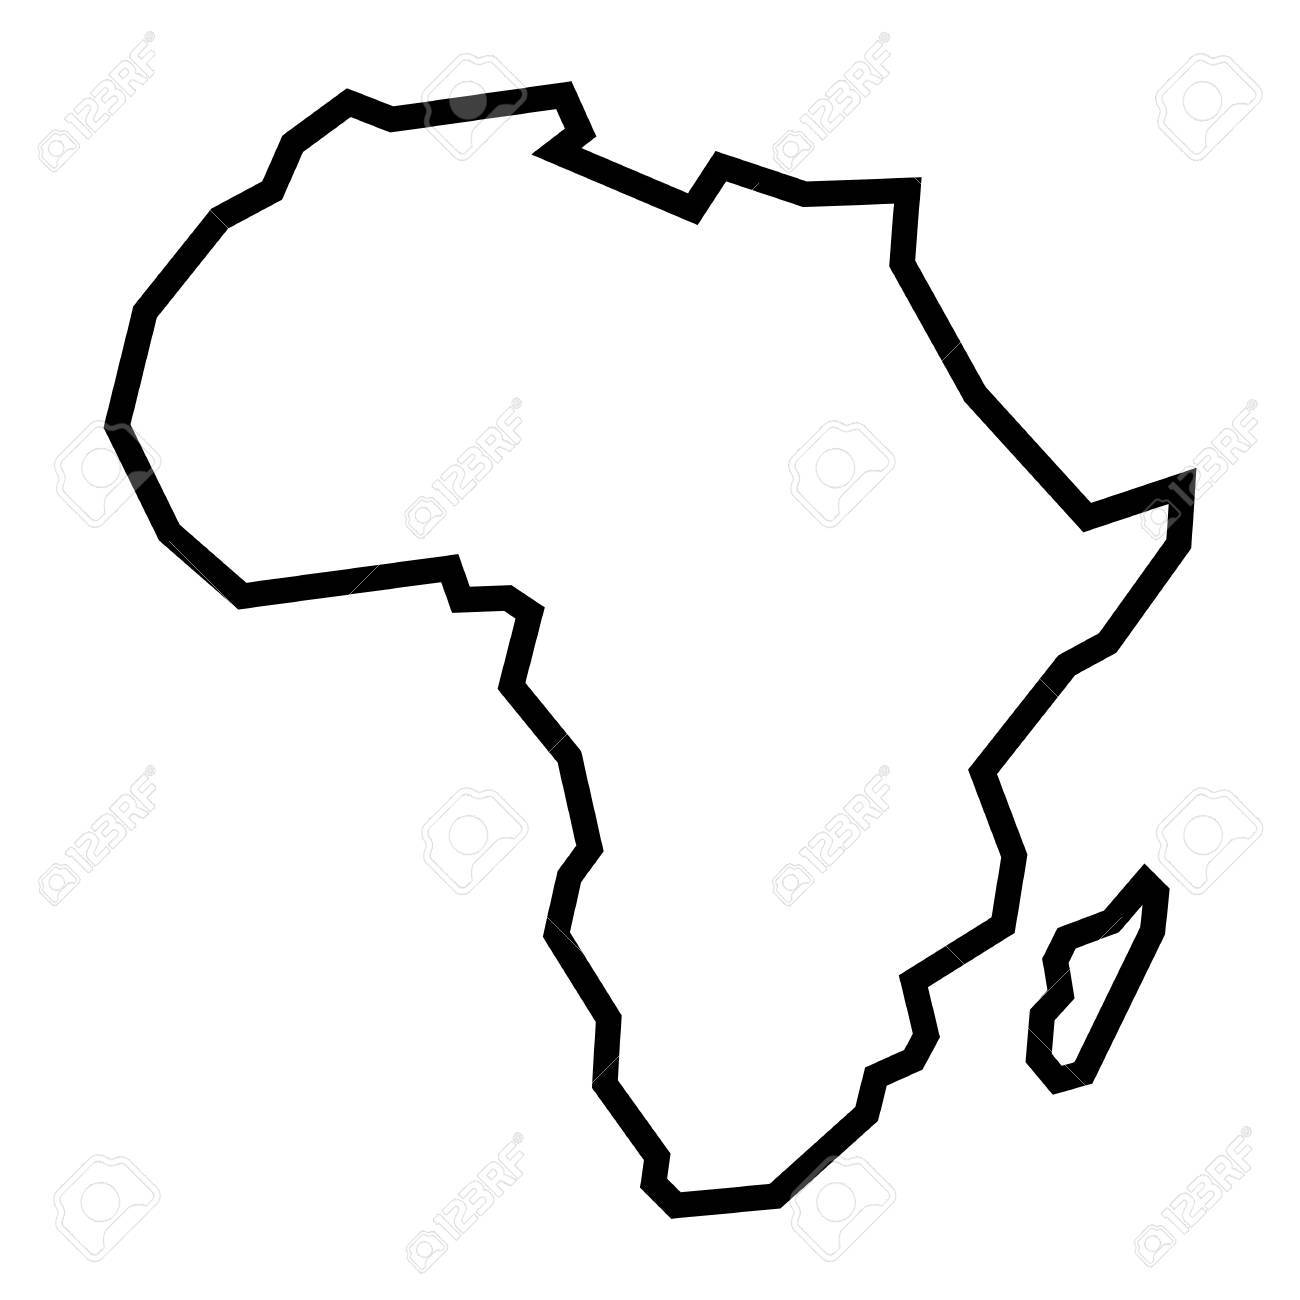 Africa Clipart Outline Africa Outline Transparent Free